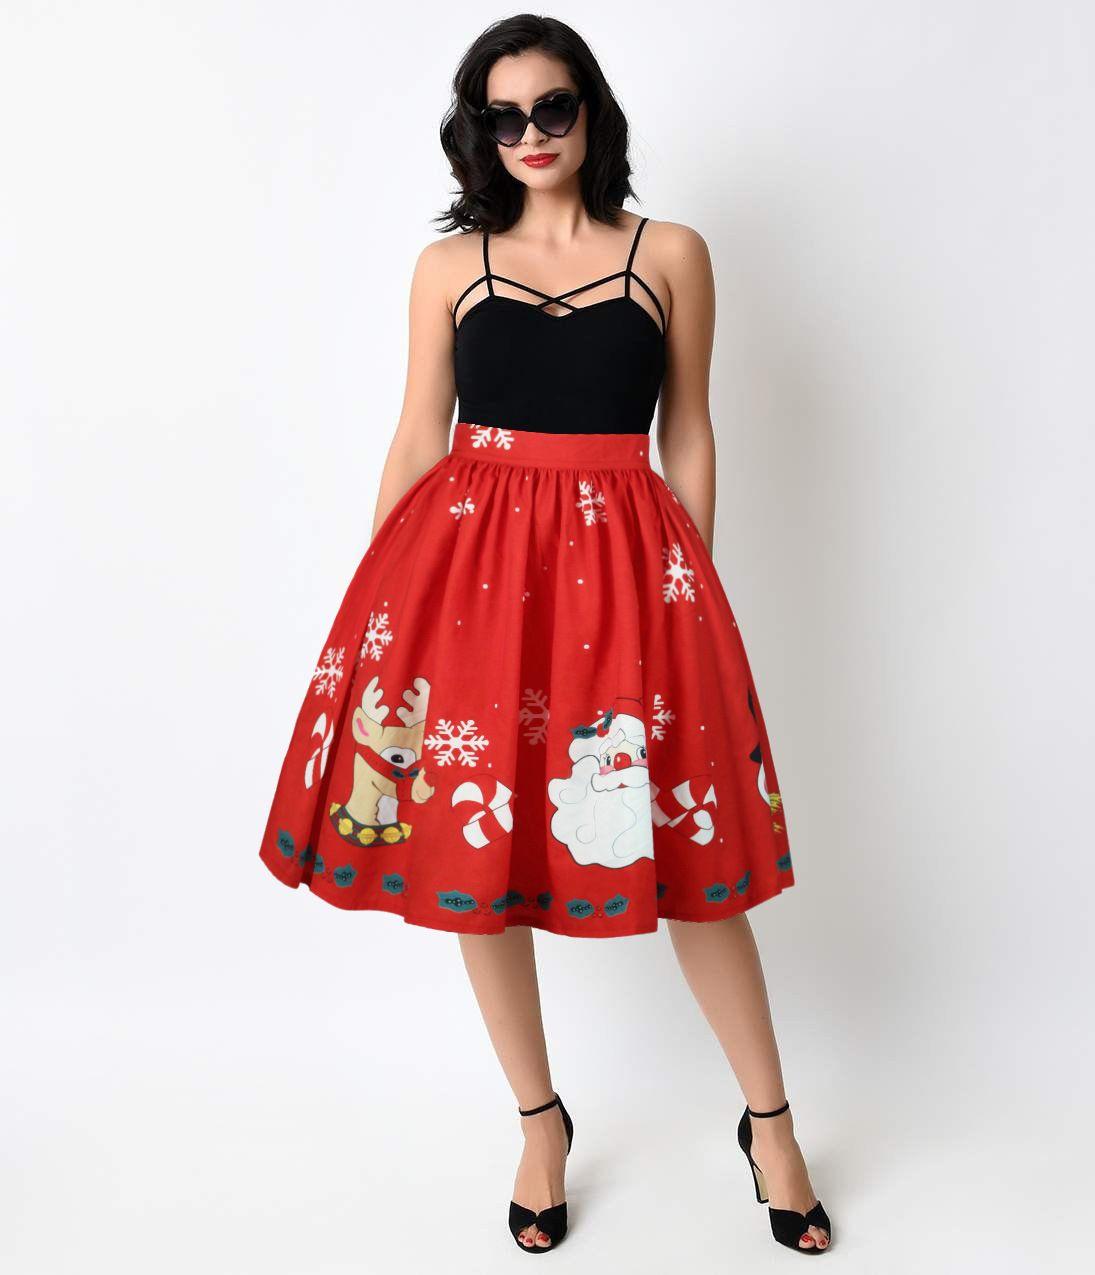 Christmas Series Womens Skirts Cartoon Santa Printing Lady Elegant Party High Waist Skirt Red Tutu Snowflake Skirts